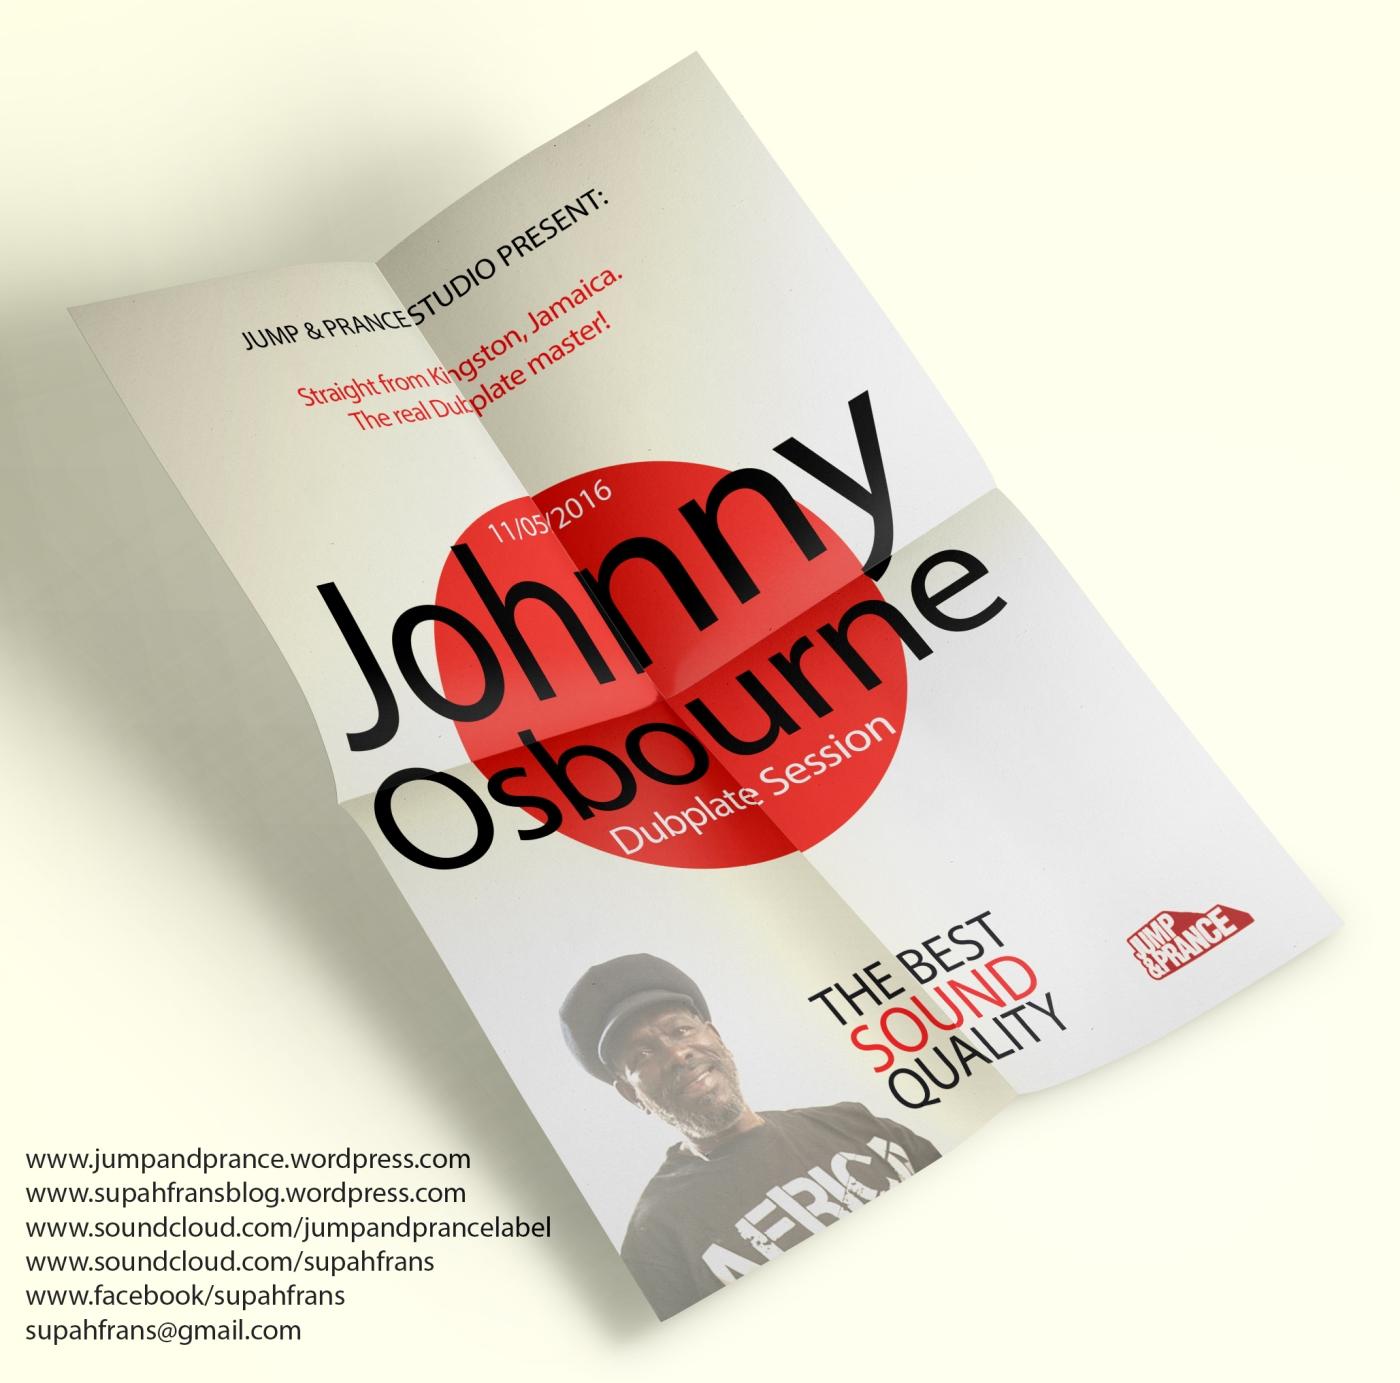 11/05/2016 - Johnny Osbourne Dubplate Session at Jump & Prance Studio (Supah Frans)